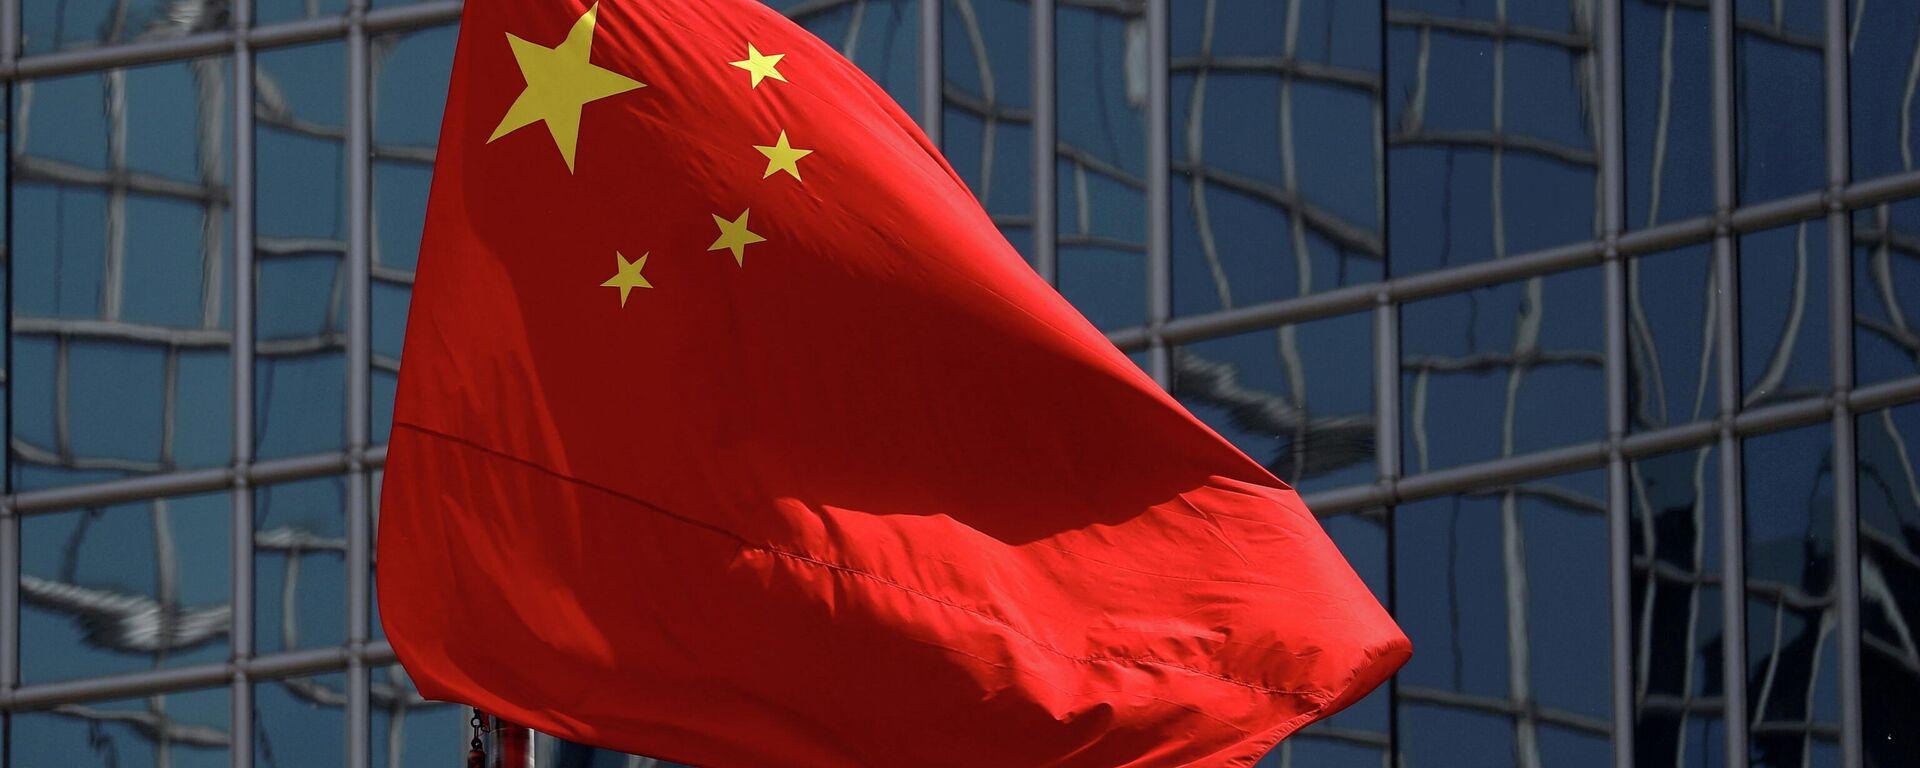 Bandera de China - Sputnik Mundo, 1920, 27.09.2021